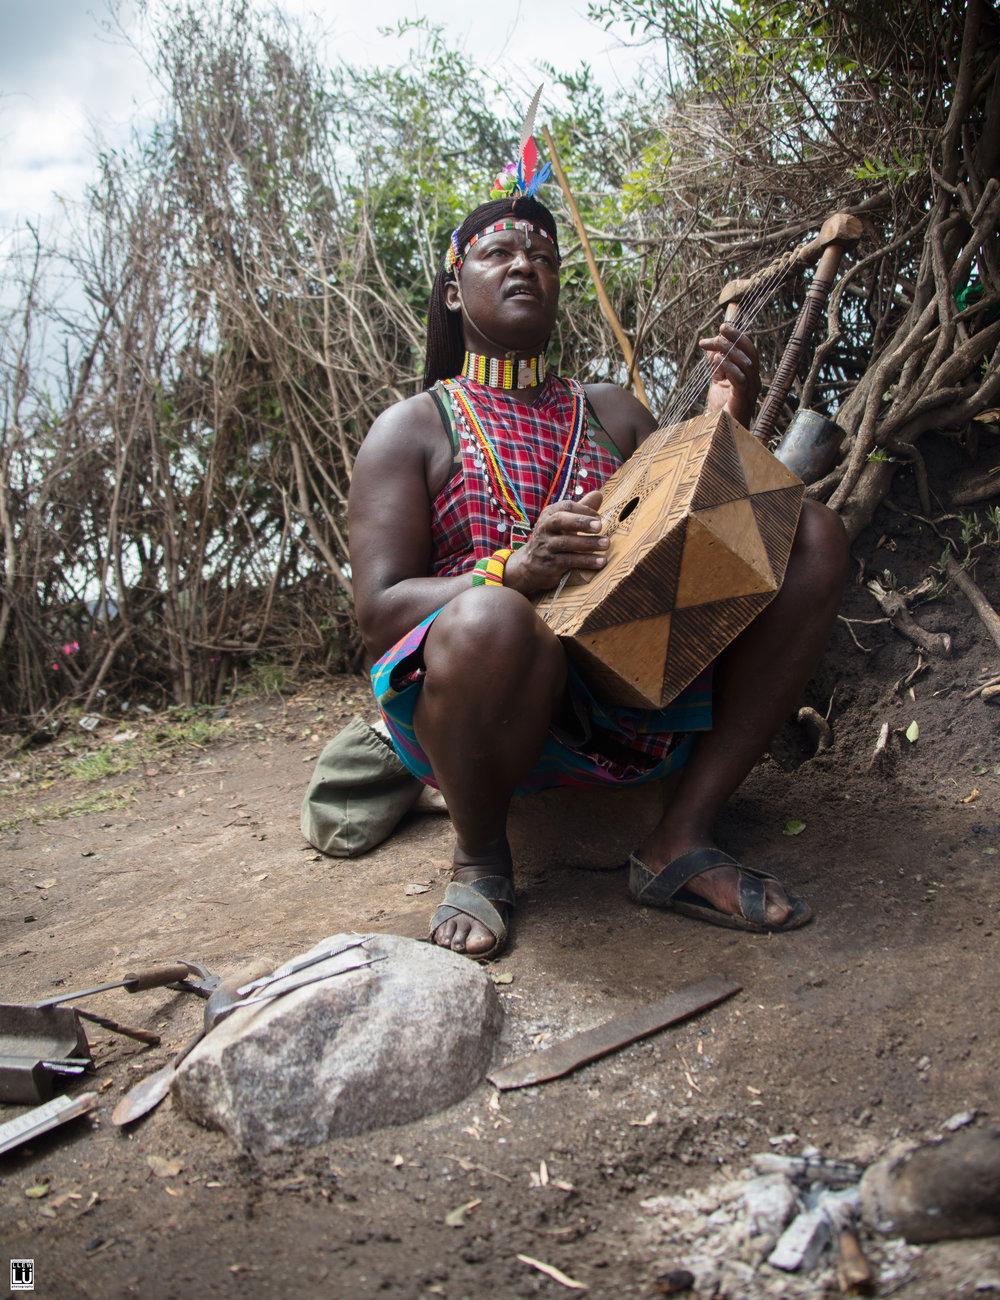 The blacksmith sang and played me a song on his Nyatiti.